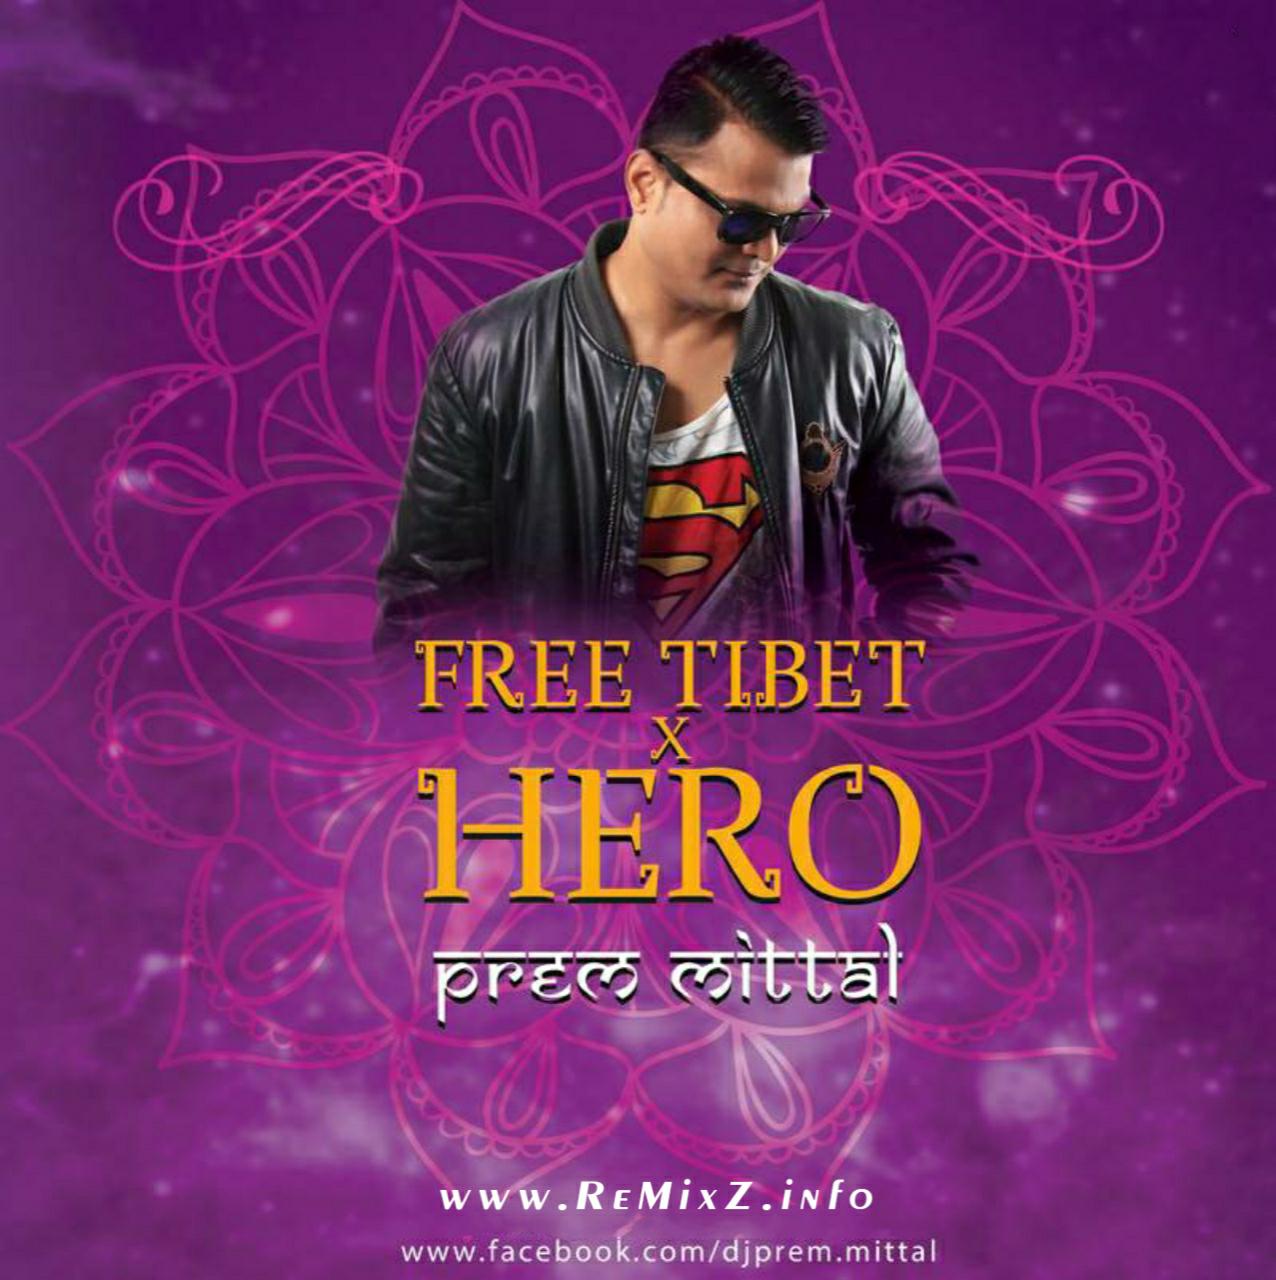 Free-Tibet-X-Hero-Mashup-Prem-Mittal.jpg